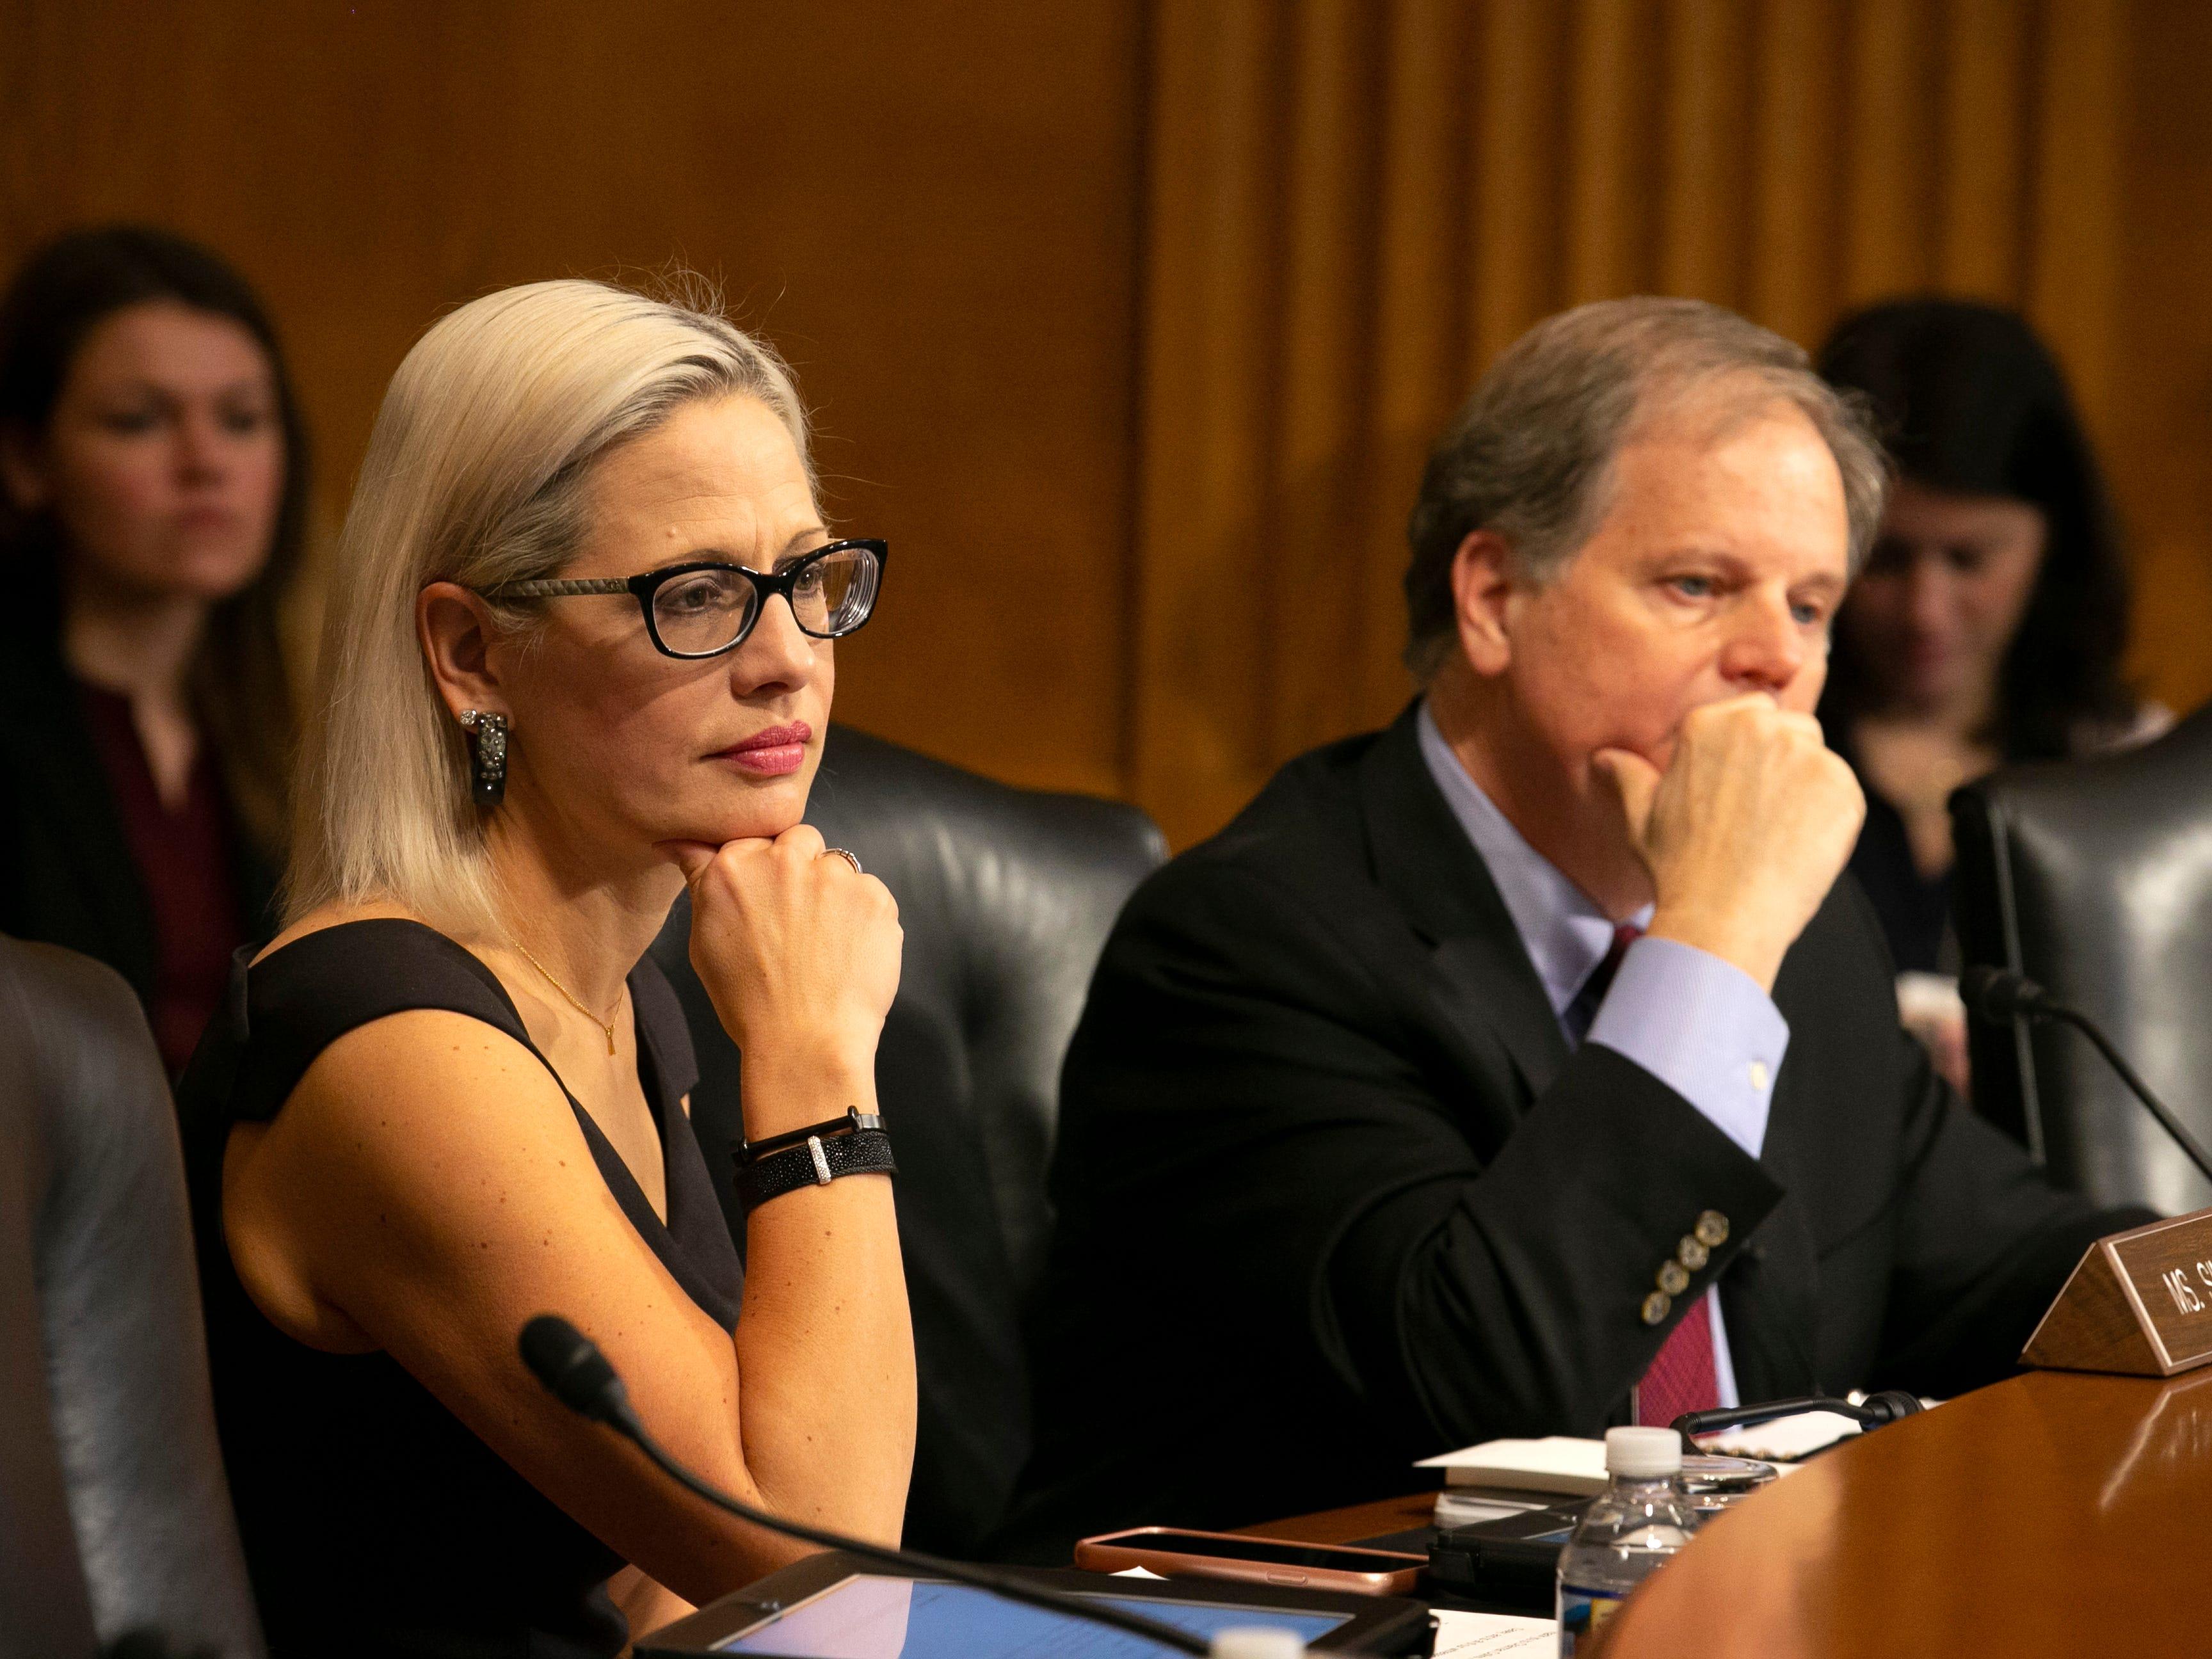 U.S. Sen. Kyrsten Sinema, D-Ariz., listens alongside U.S. Sen. Doug Jones, D-Ala., during the U.S. Senate Special Committee on Aging at the U.S. Capitol in Washington, D.C., on Feb. 6, 2019.